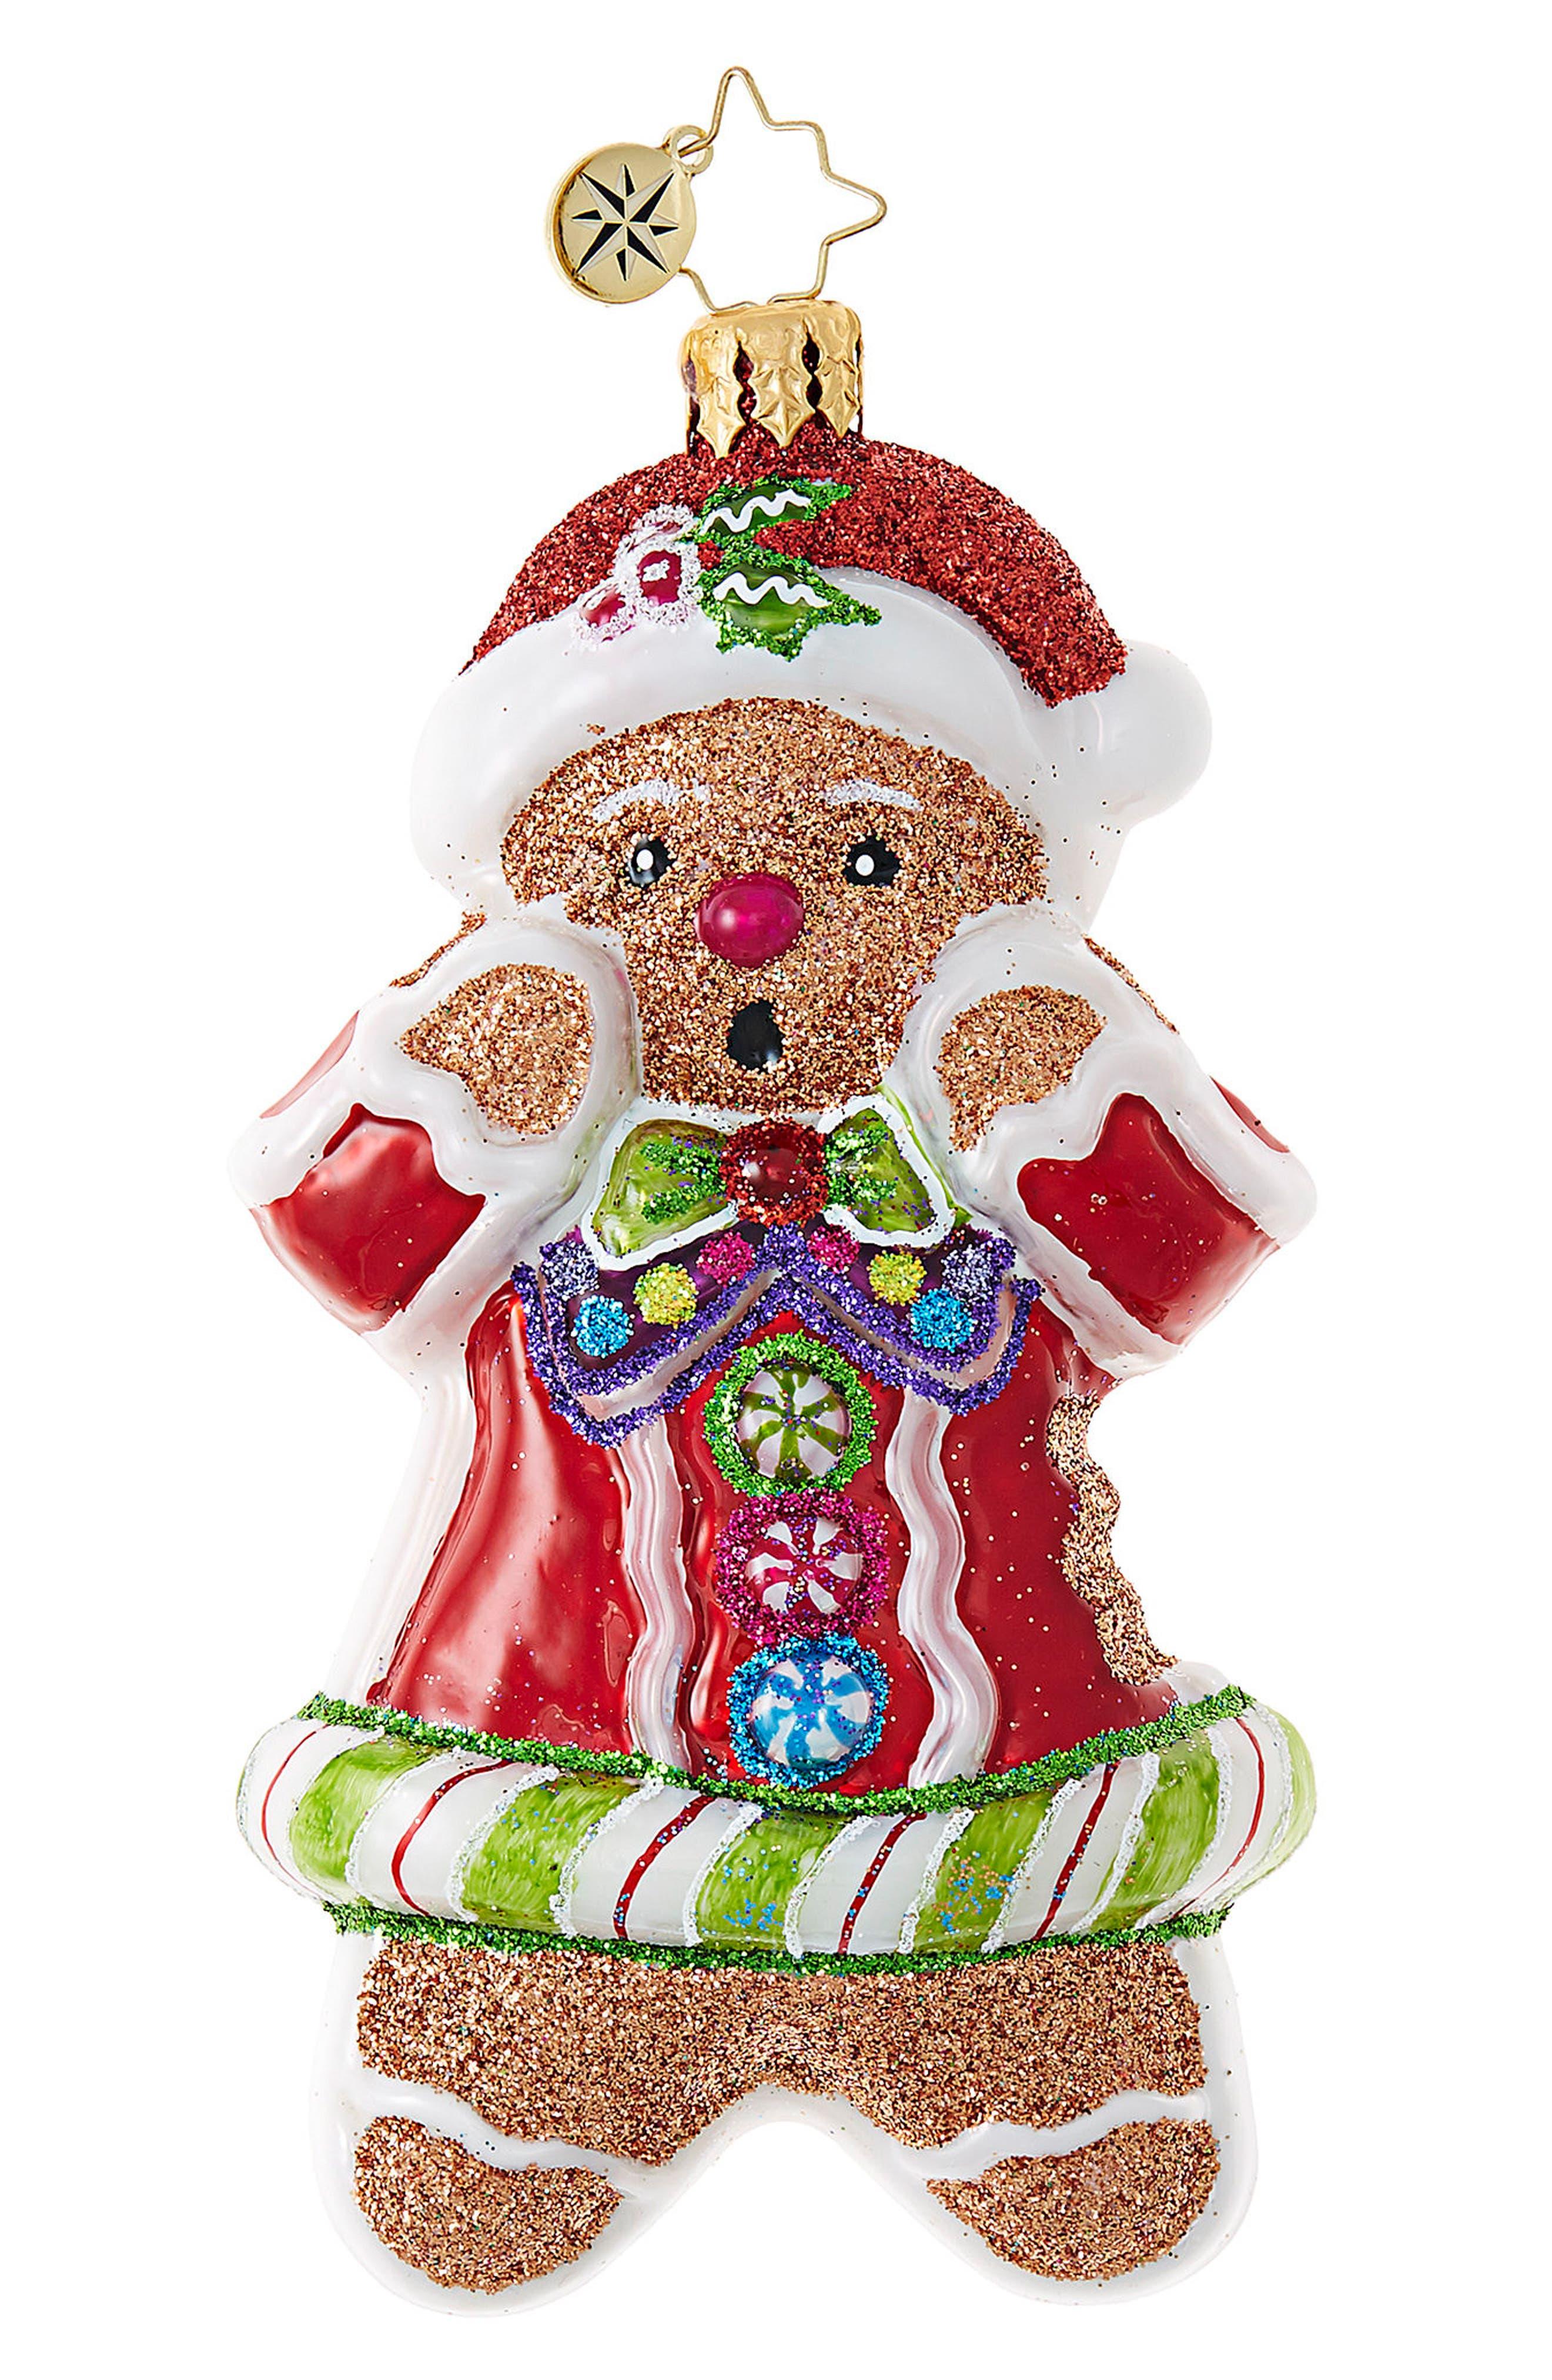 Alternate Image 1 Selected - Christopher Radko Just One Bite Gingerbread Man Santa Claus Ornament